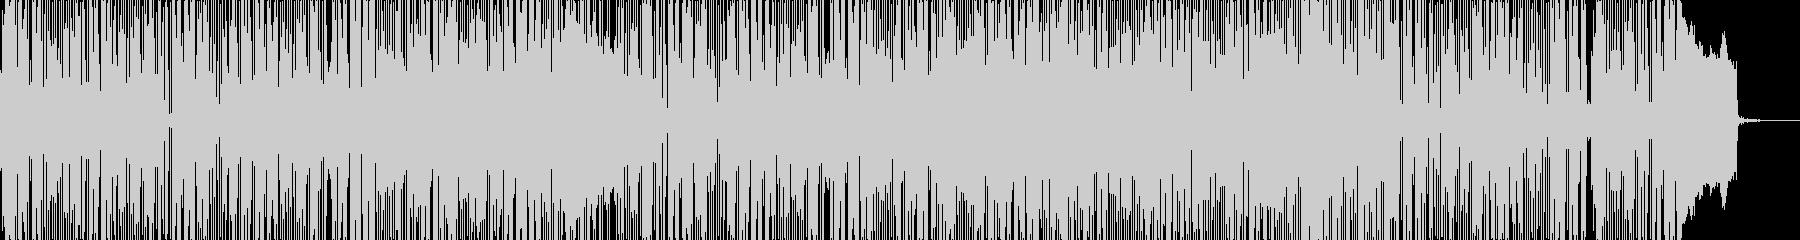 R&B風の切ない雰囲気のPopバラードの未再生の波形